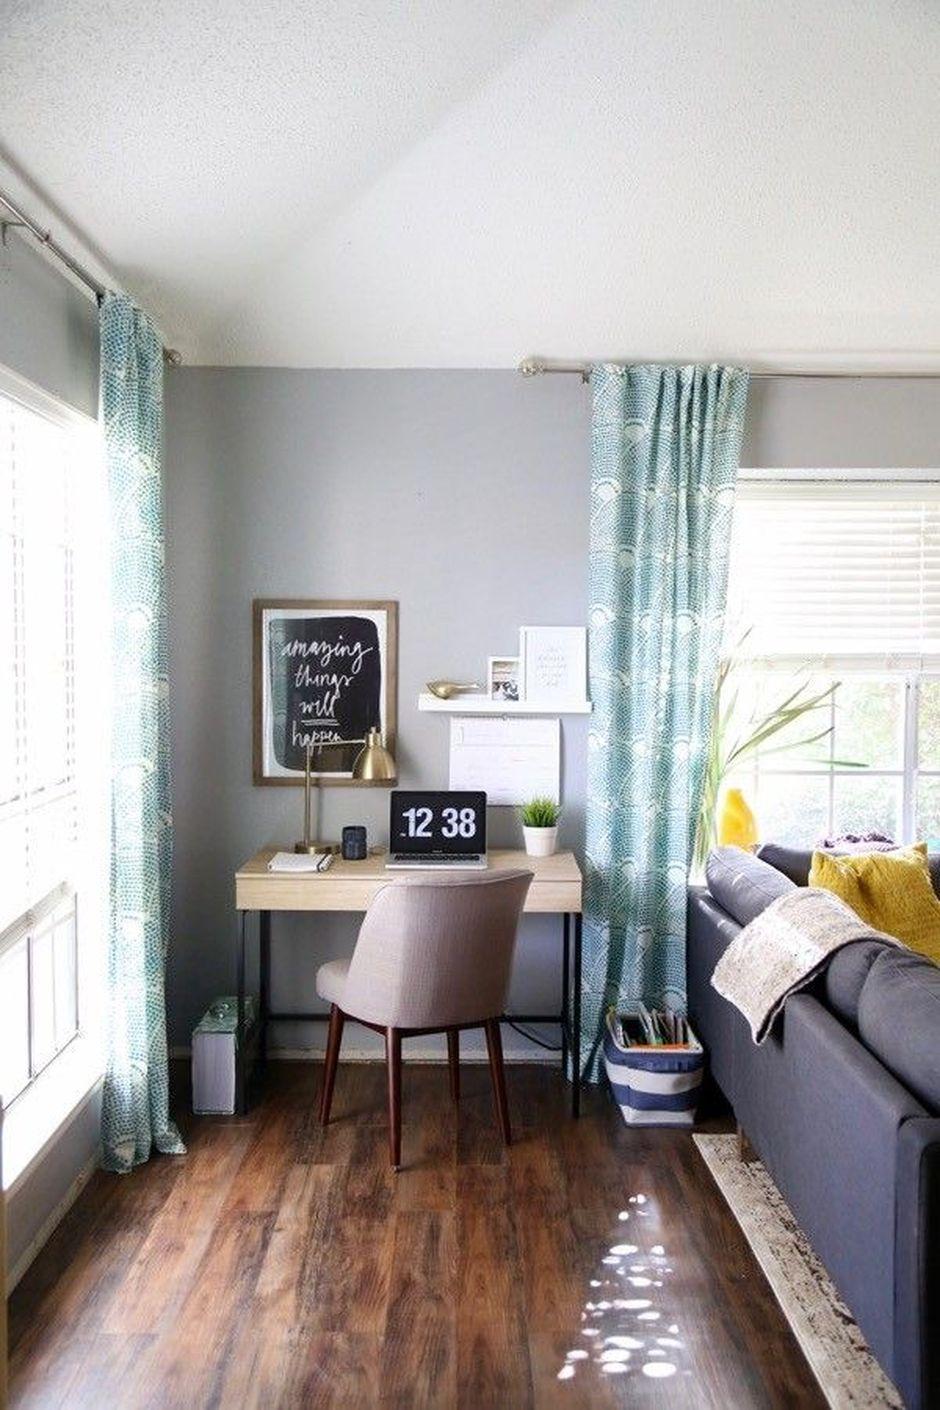 Luxury Vinyl Plank Flooring Inspirations 40 | Living room ...